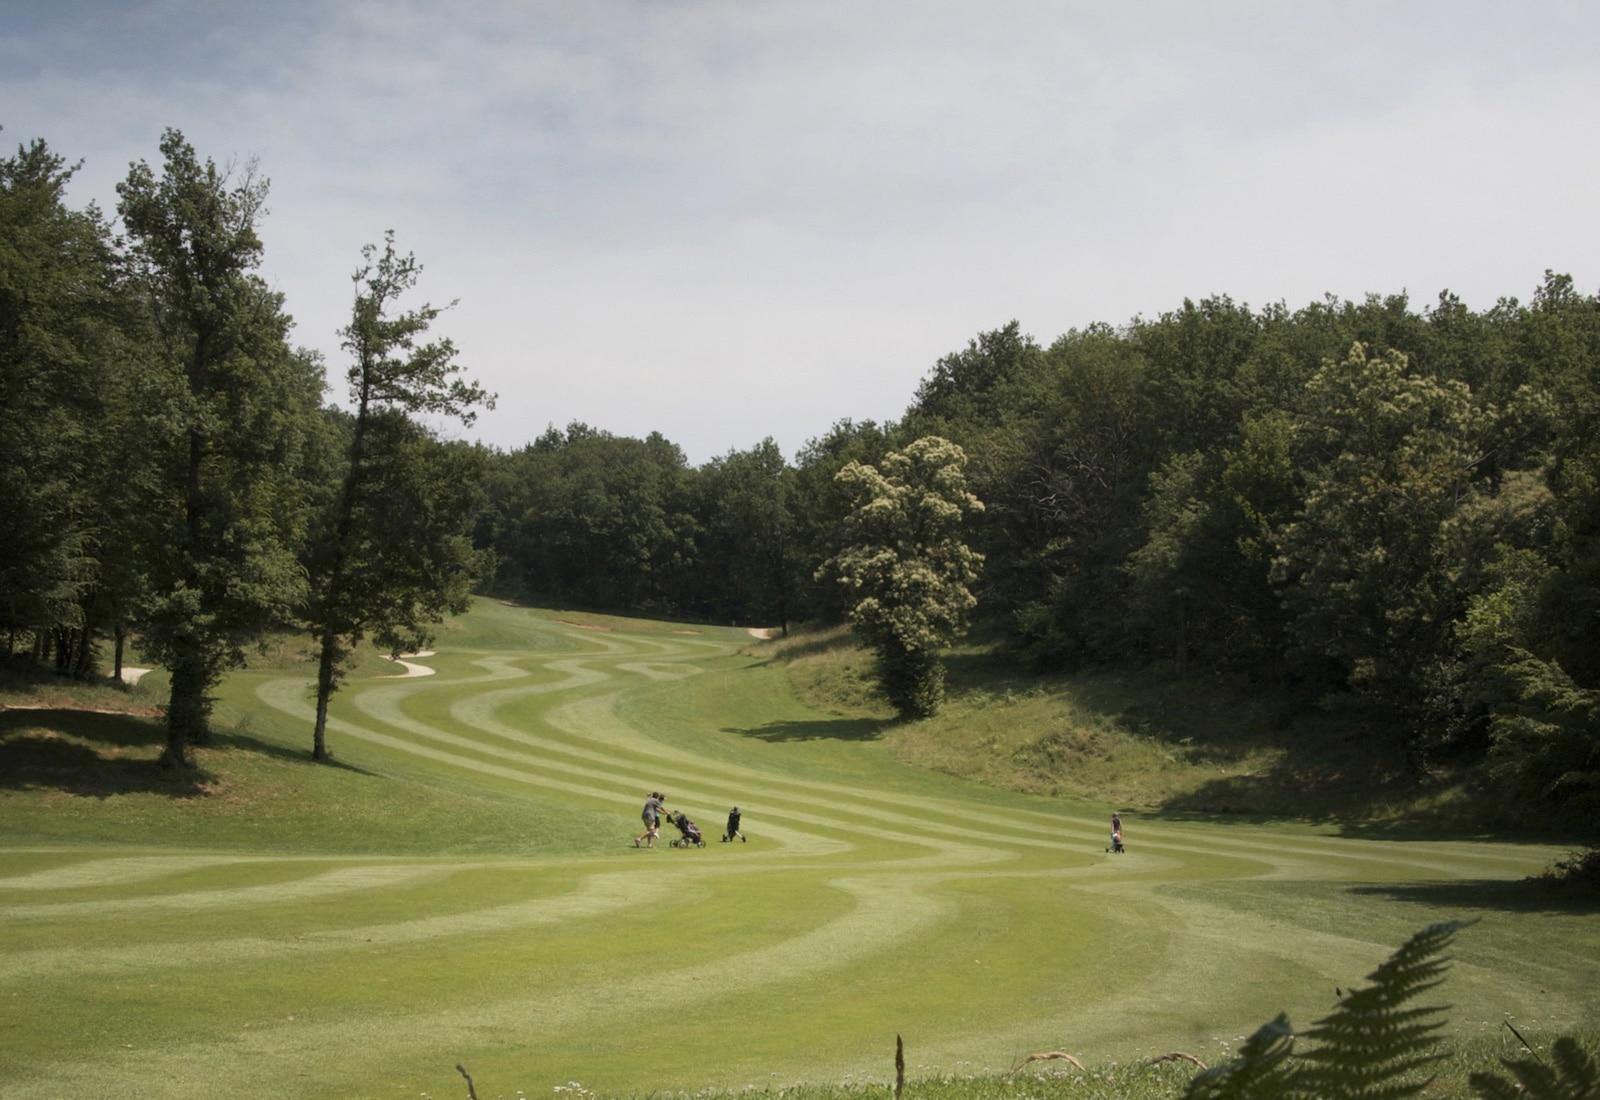 golf de toulouse seilh two 18 hole golf course near toulouse france. Black Bedroom Furniture Sets. Home Design Ideas